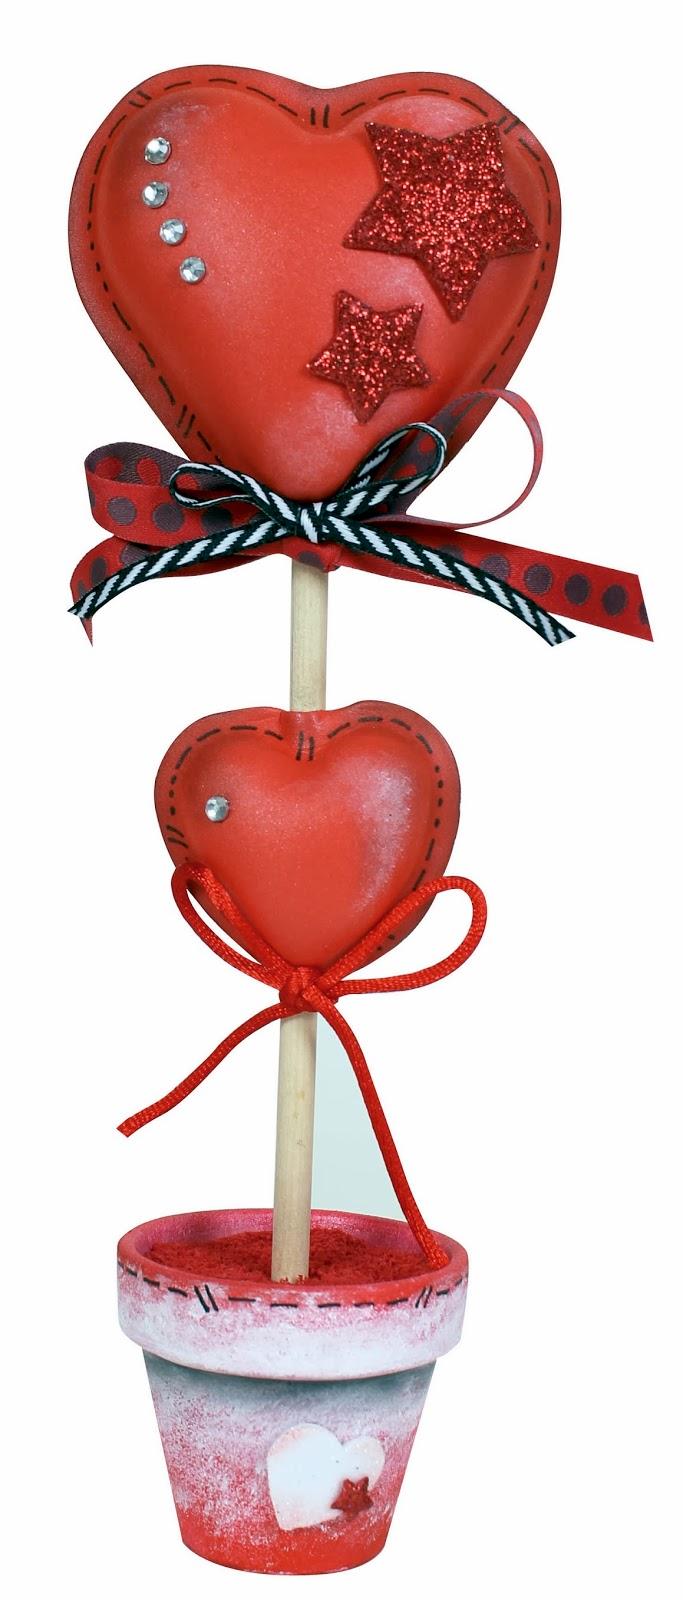 Manualidades goma eva San Valentín - Imagui